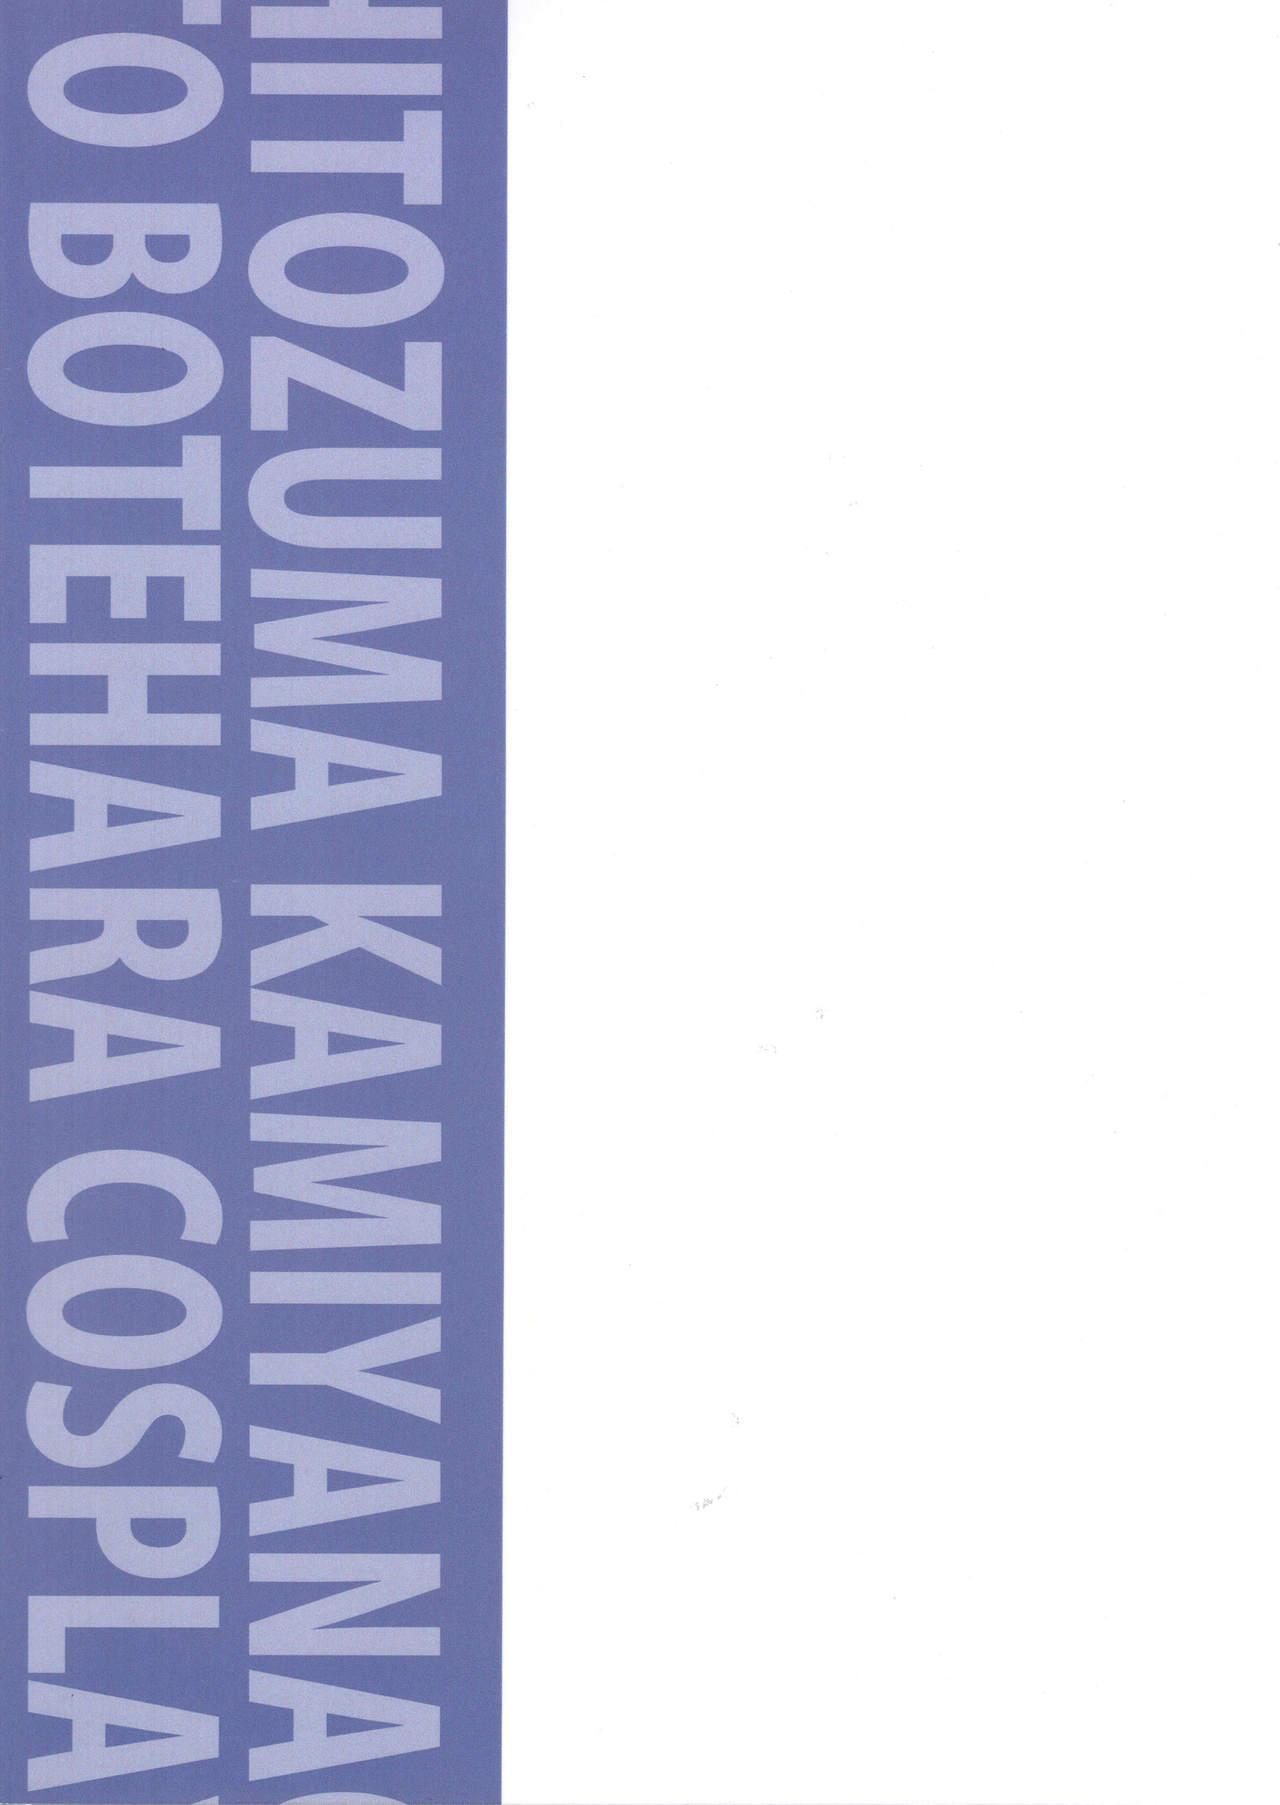 Hitozuma Nao to Botebara Cosplay H 25